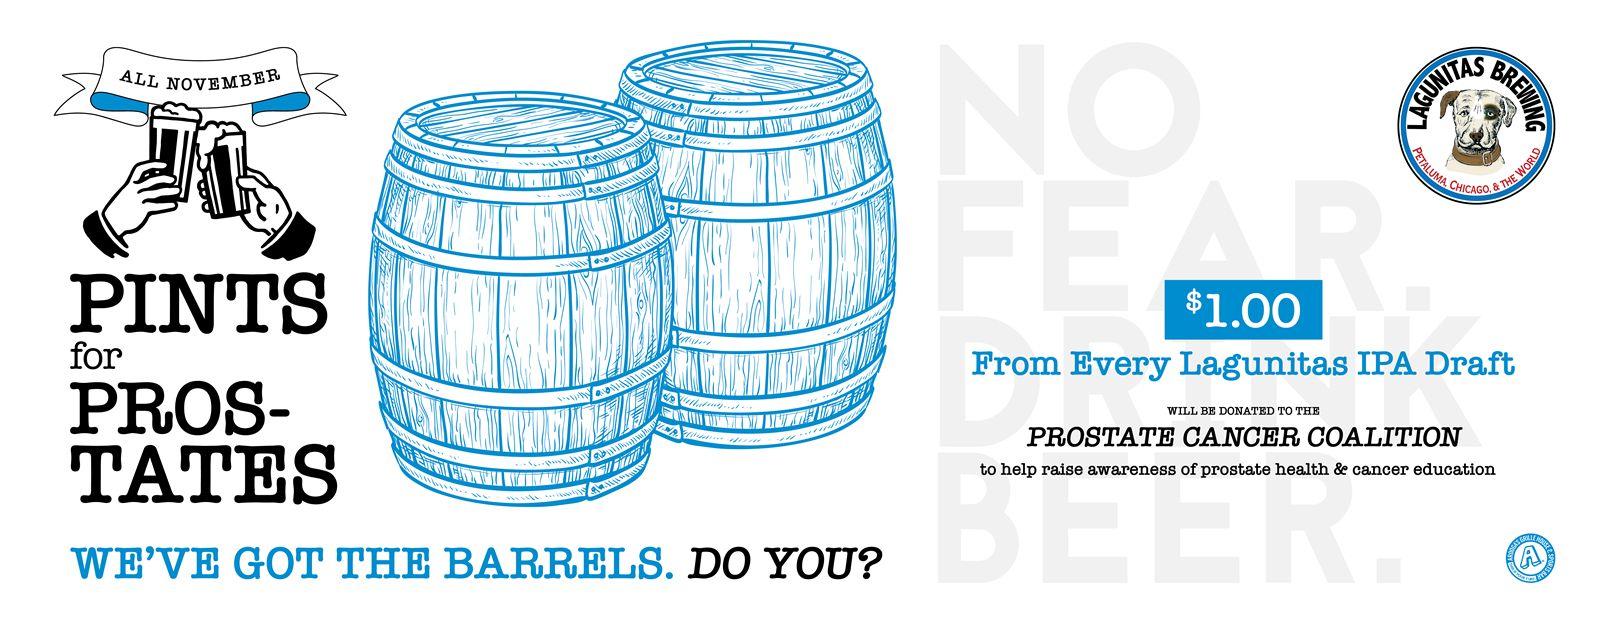 Arooga's Celebrates NovemBeer with Pints for Prostates